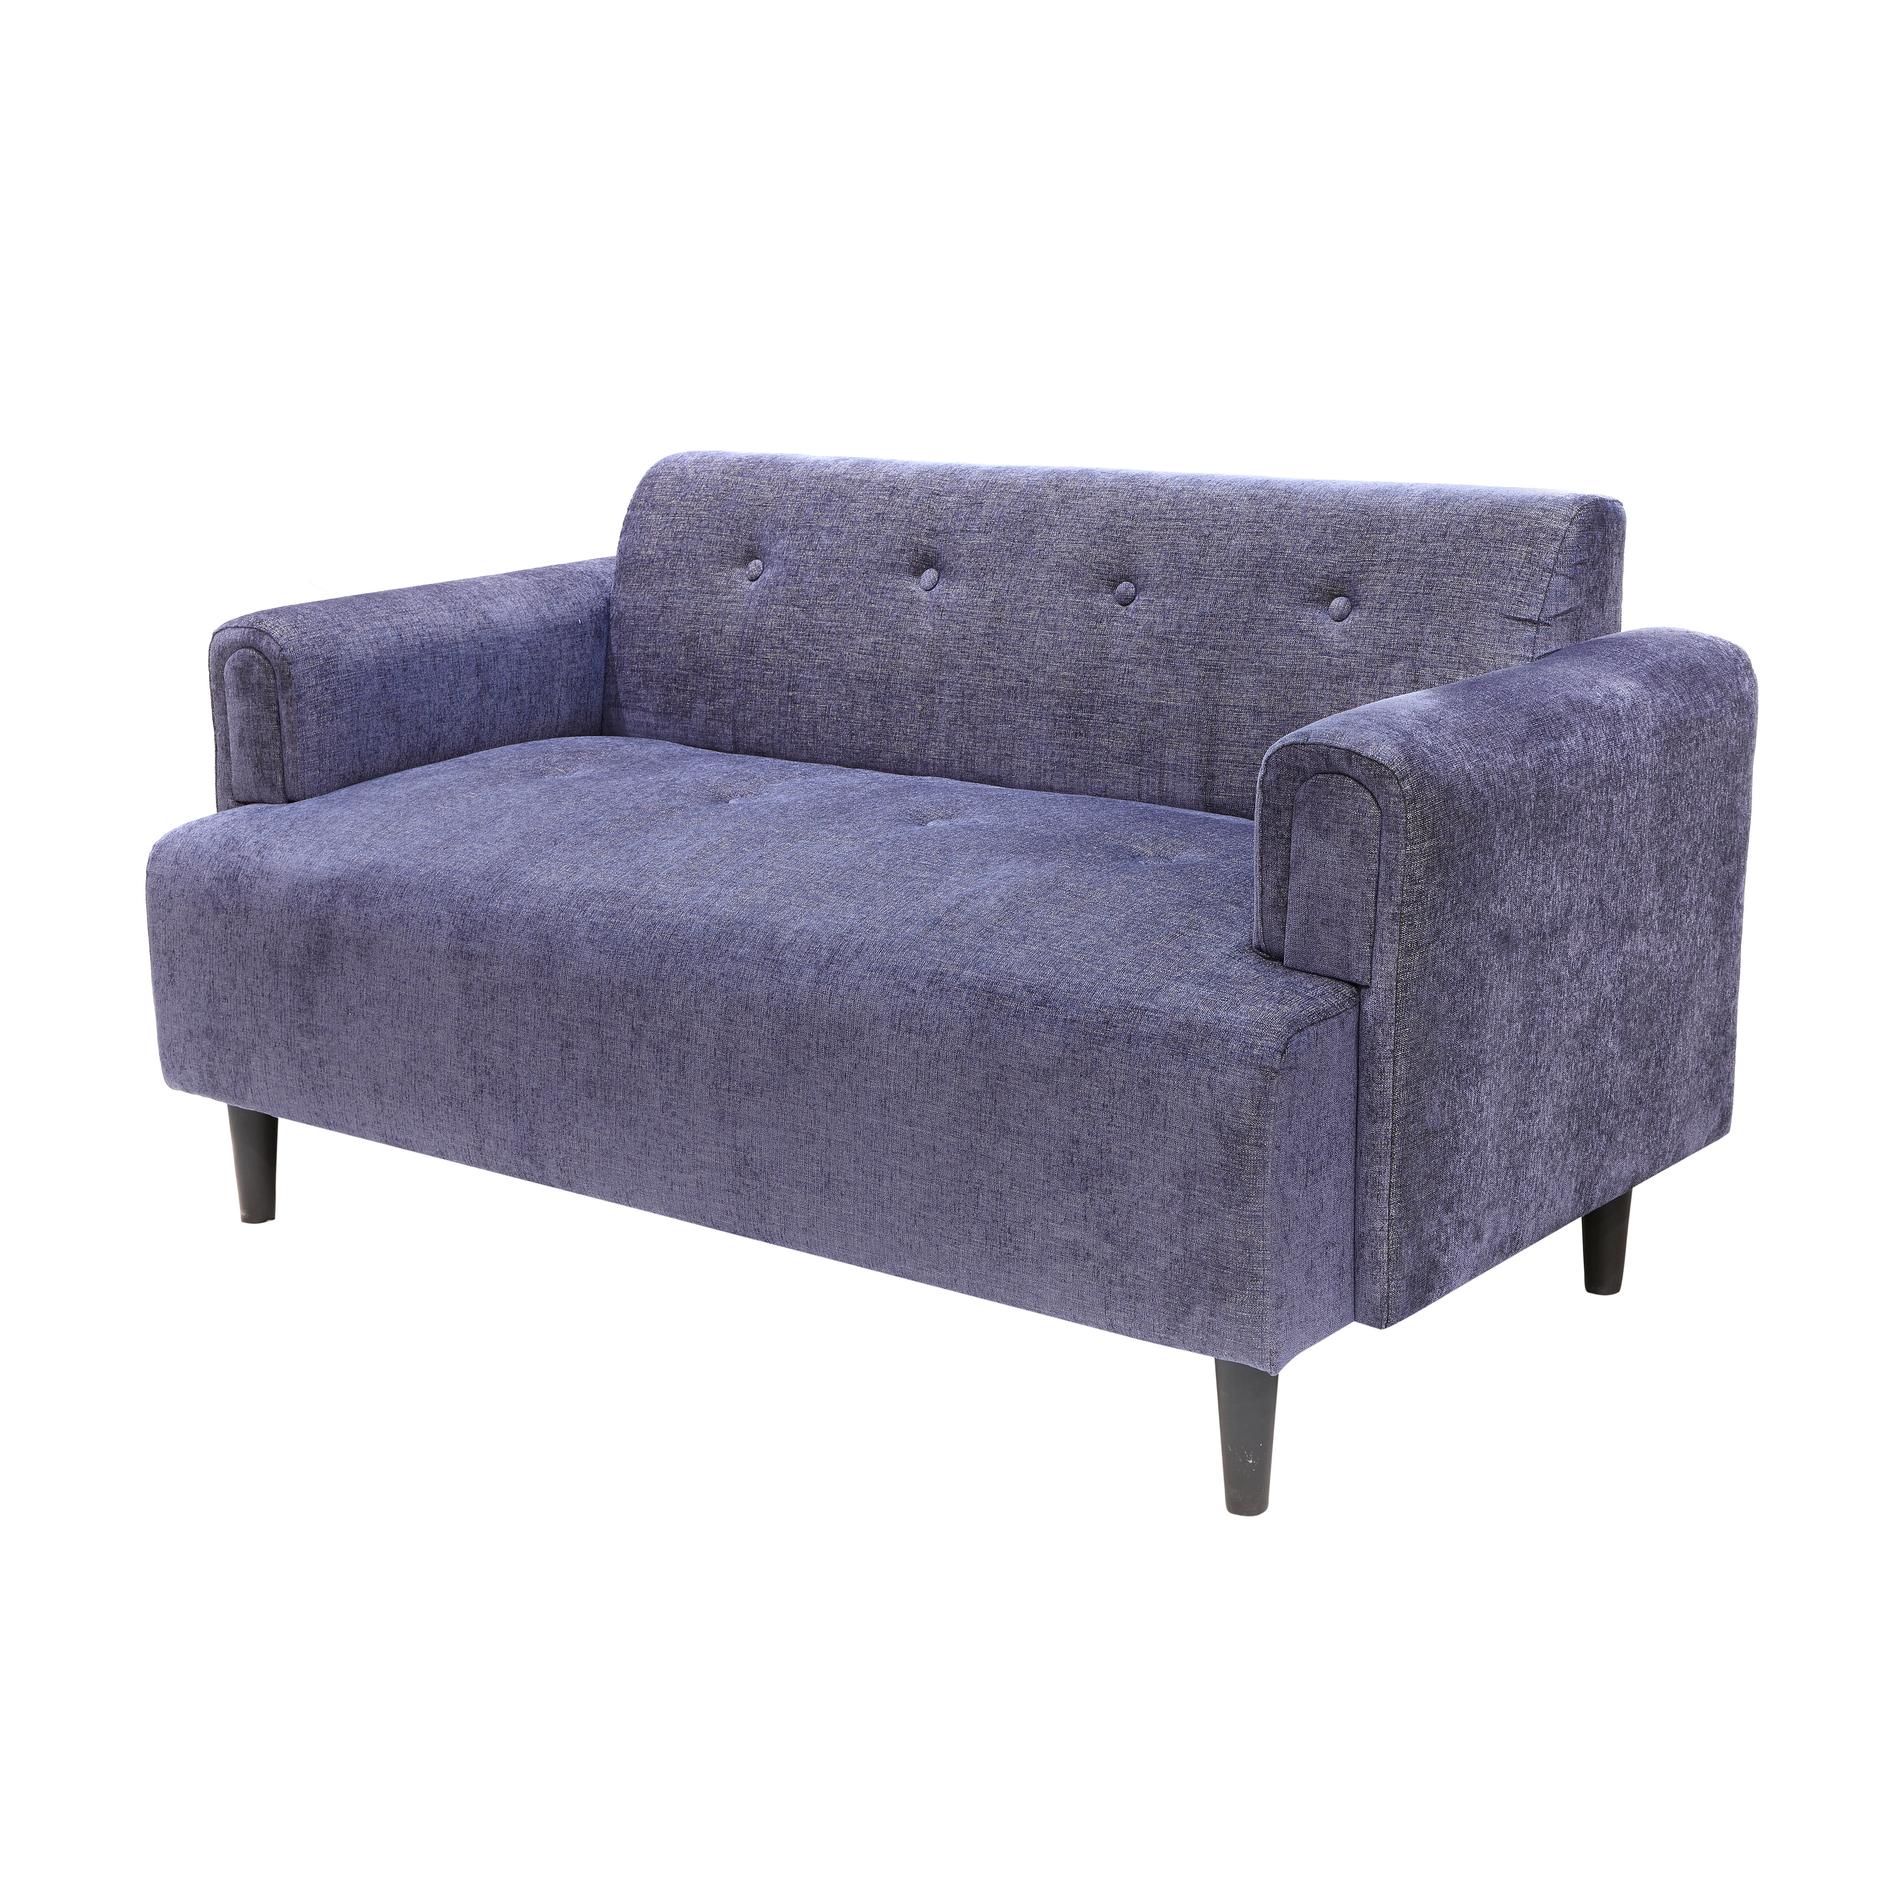 Sofa rhapsody posti legno e tessuto with divani letto 2 posti - Divani letto 2 posti economici ...